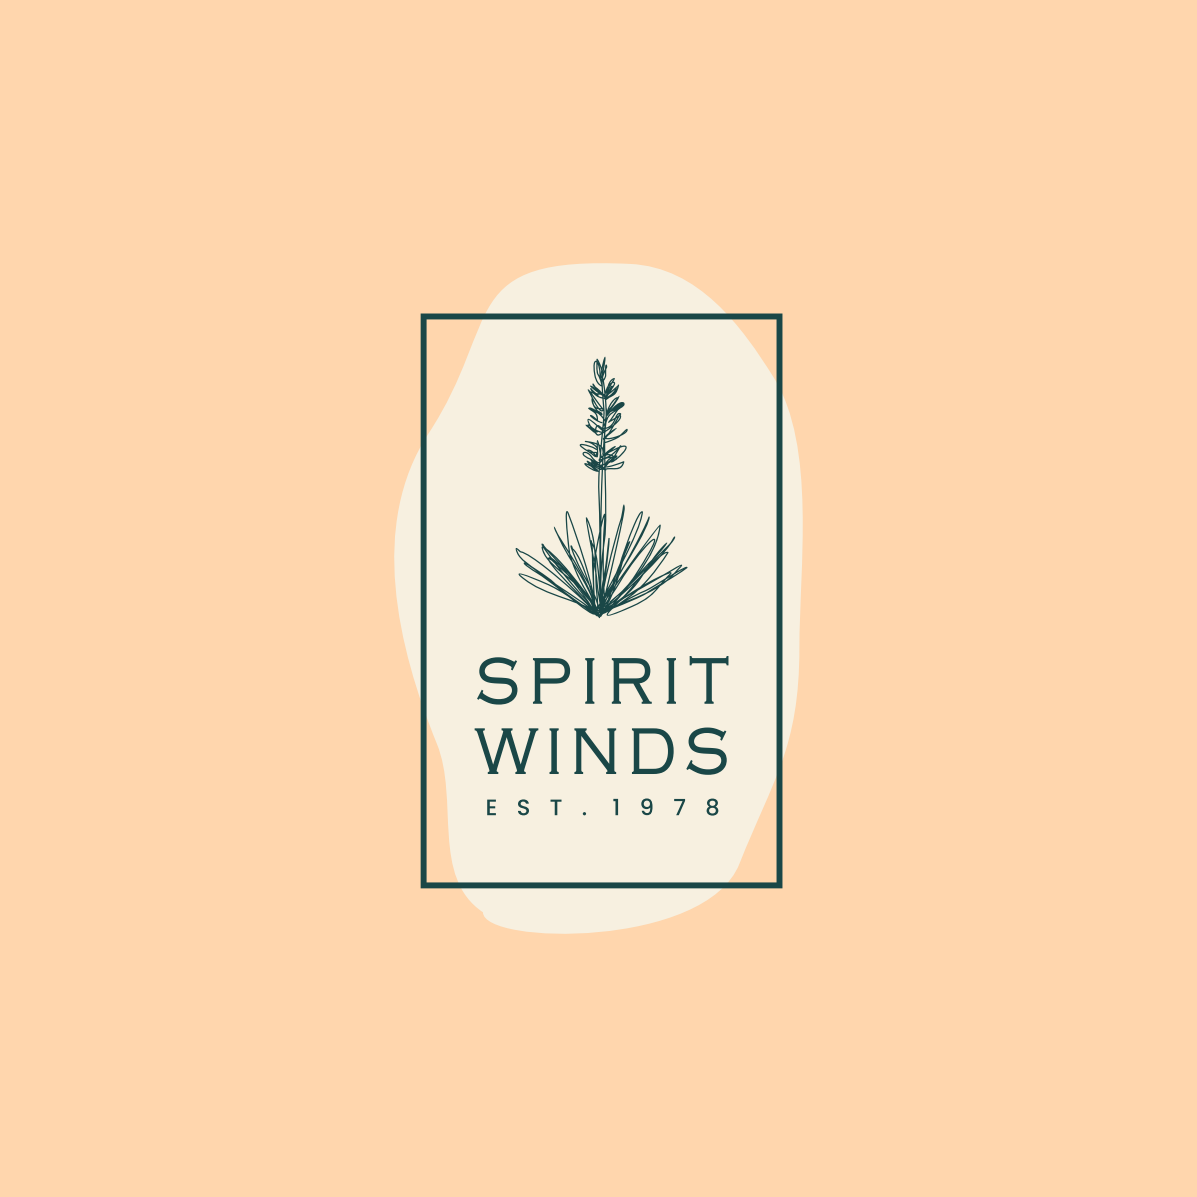 spirit winds logo with yucca